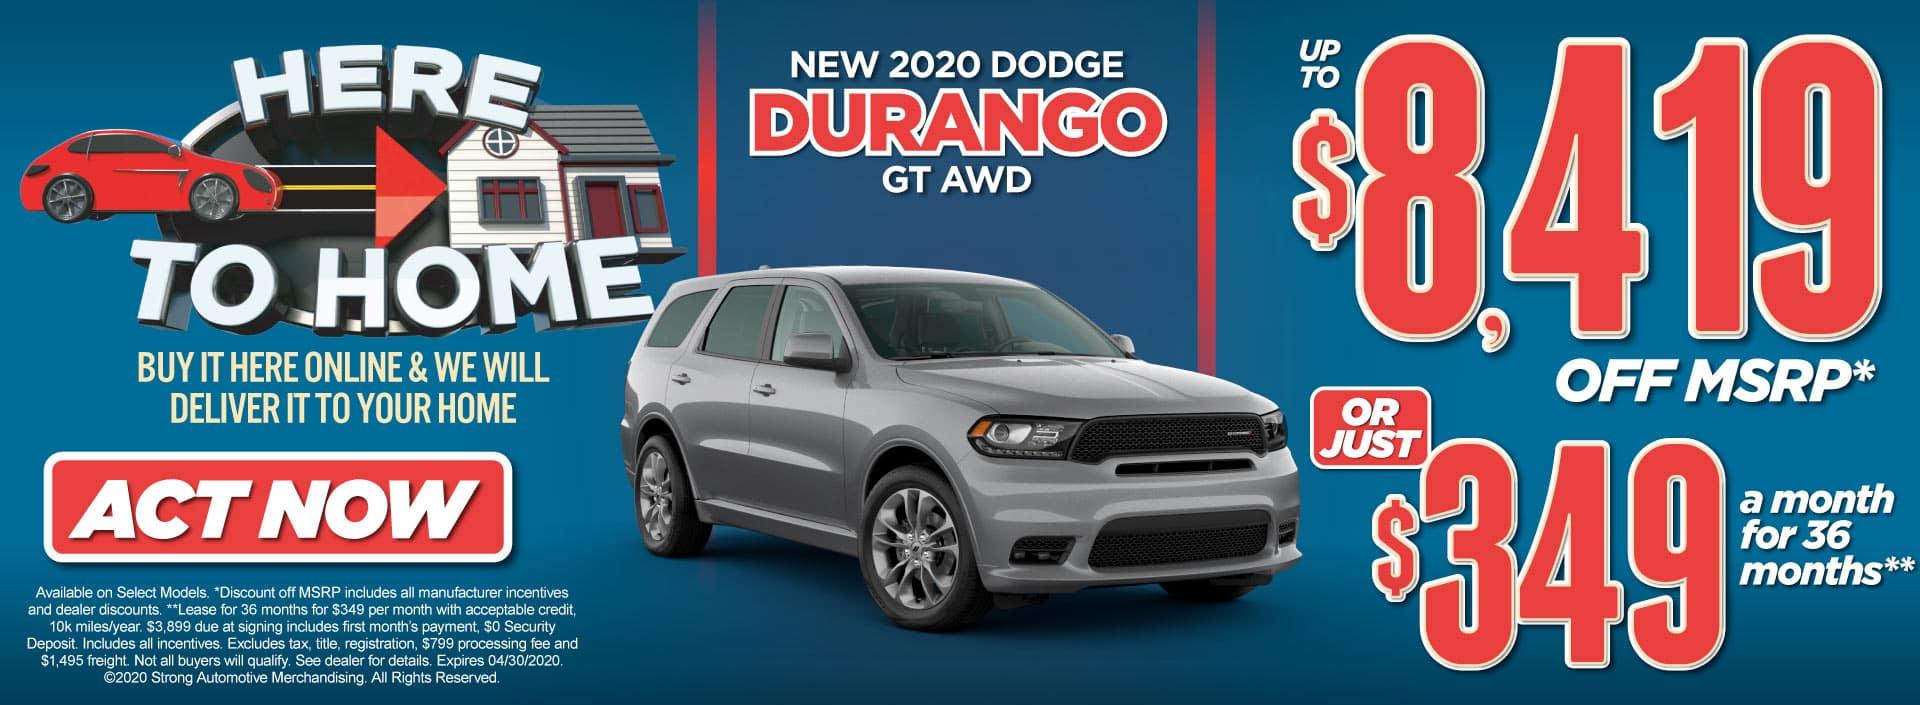 New 2020 Dodge Durango Special Act Now